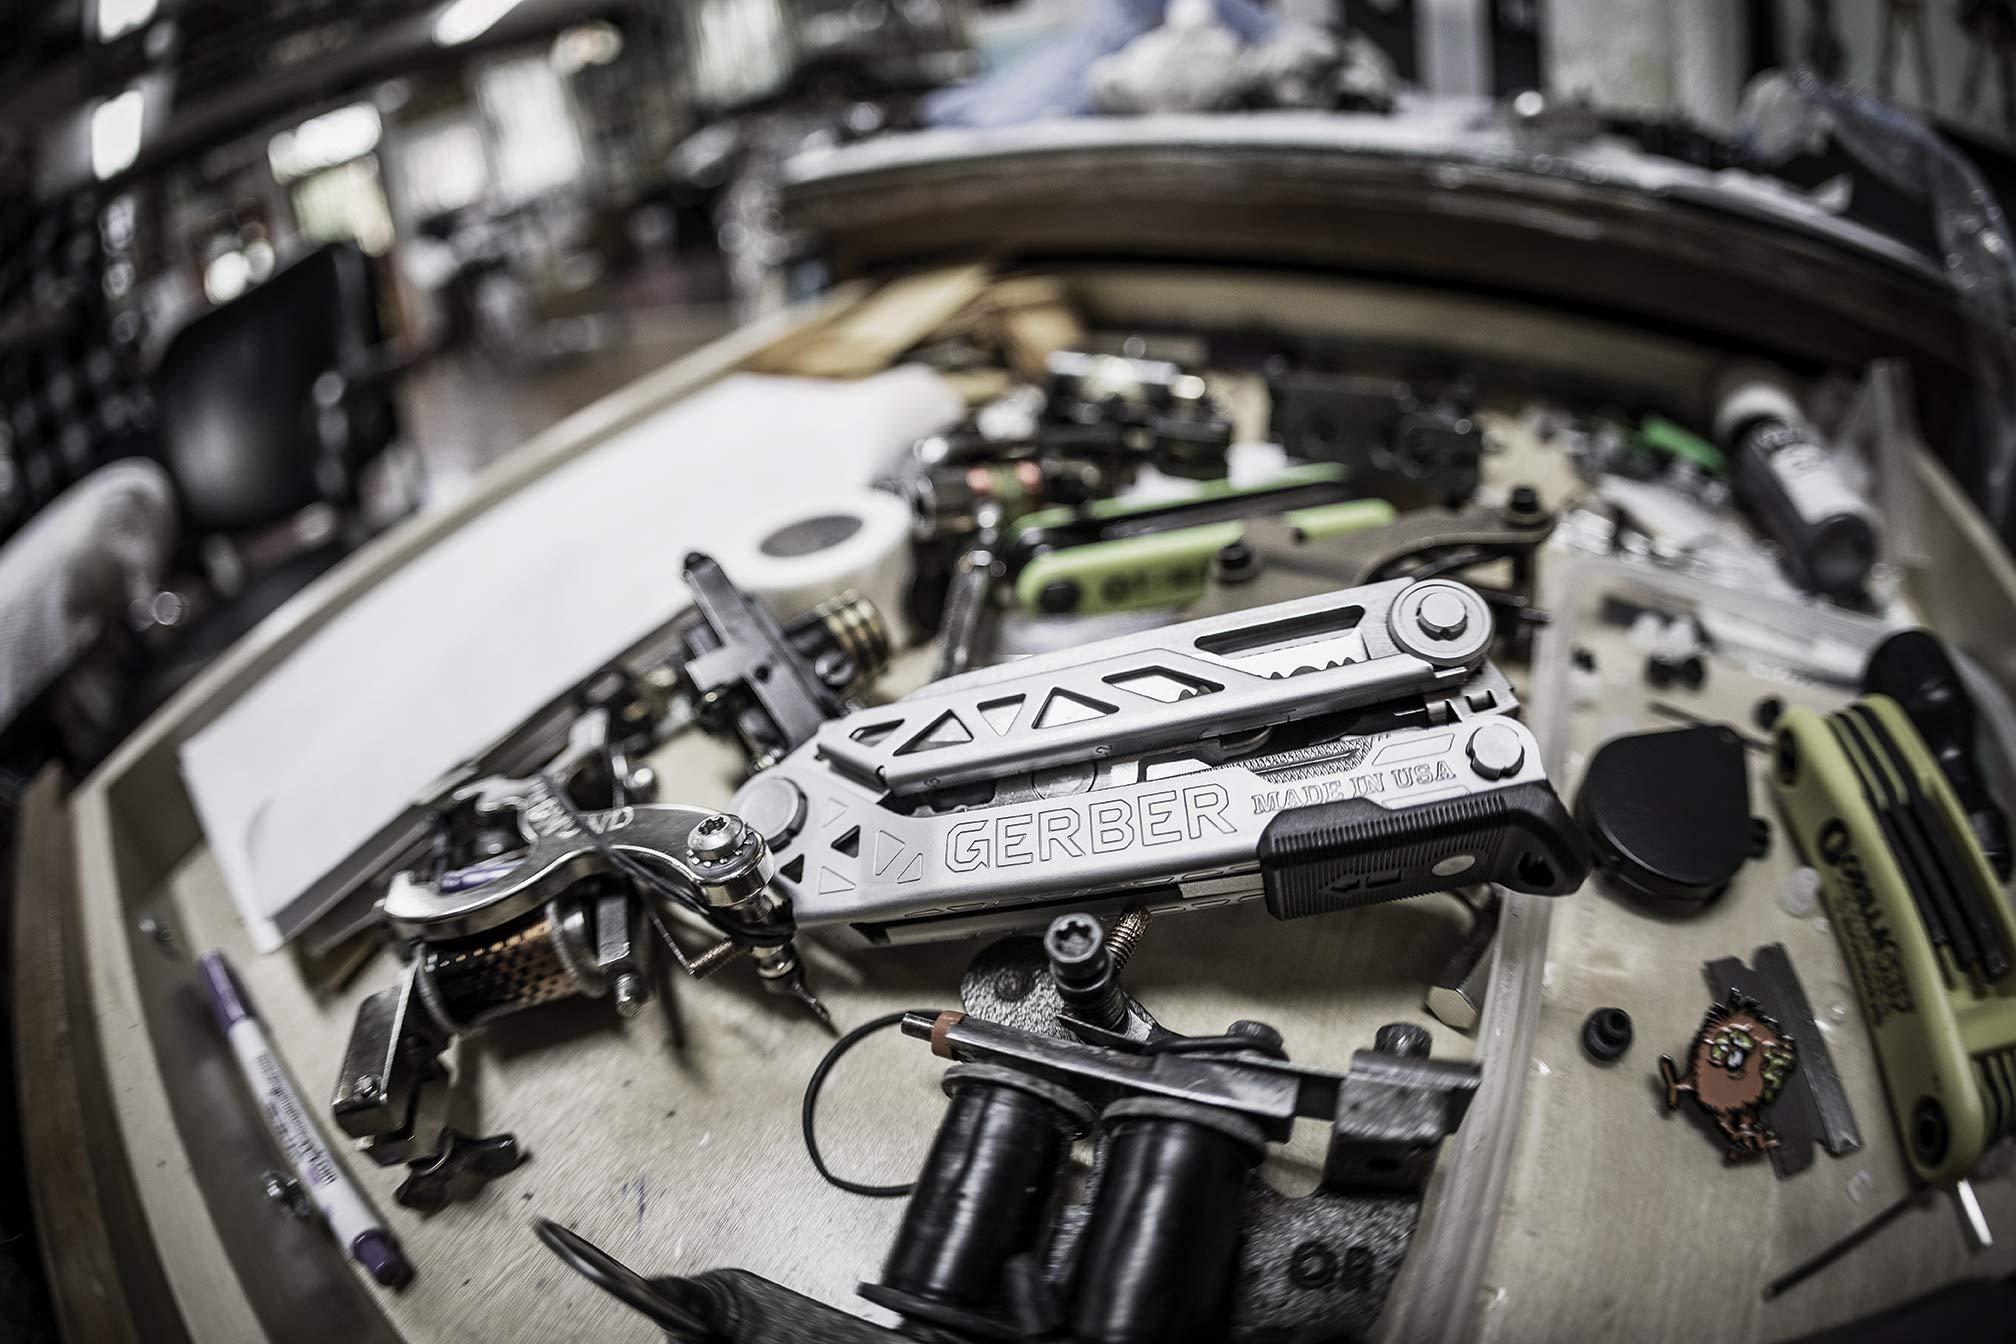 Gerber Center-Drive Plus Multi-Tool | Bit Set, Premium Leather Sheath [30-001417] by Gerber (Image #9)